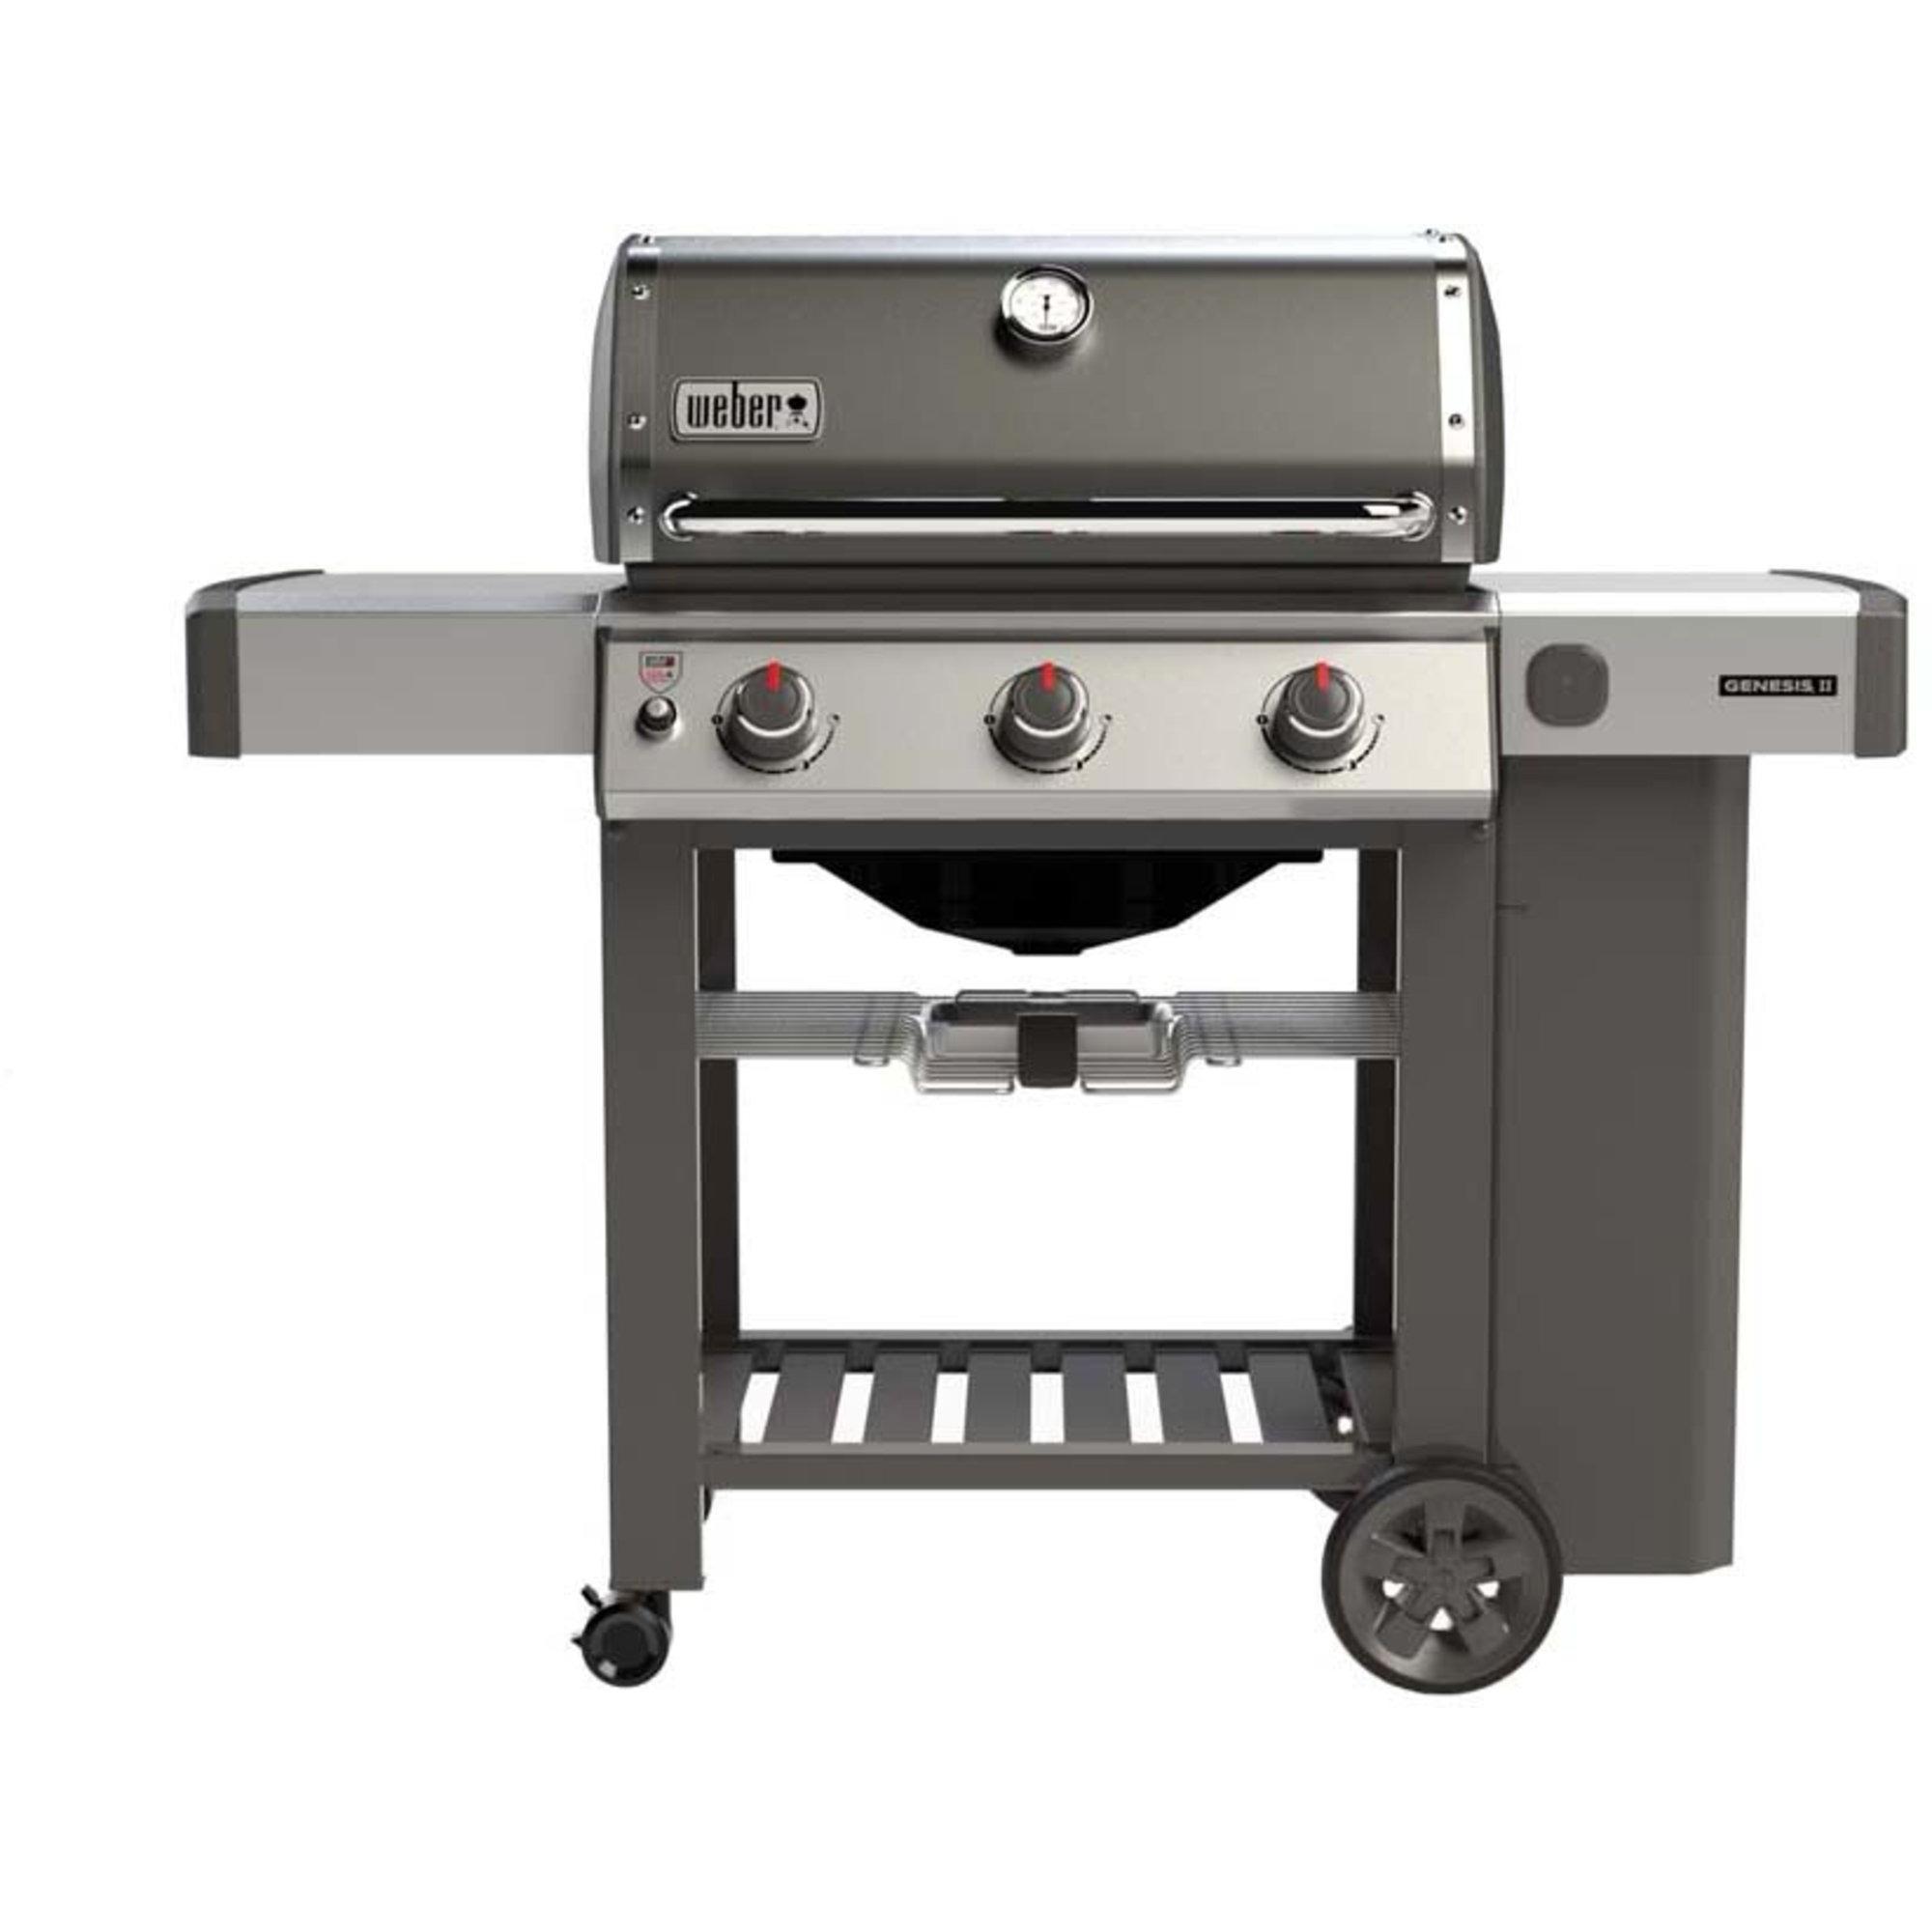 Weber Genesis® II E-310 GBS Gasolgrill – Smoke Grey